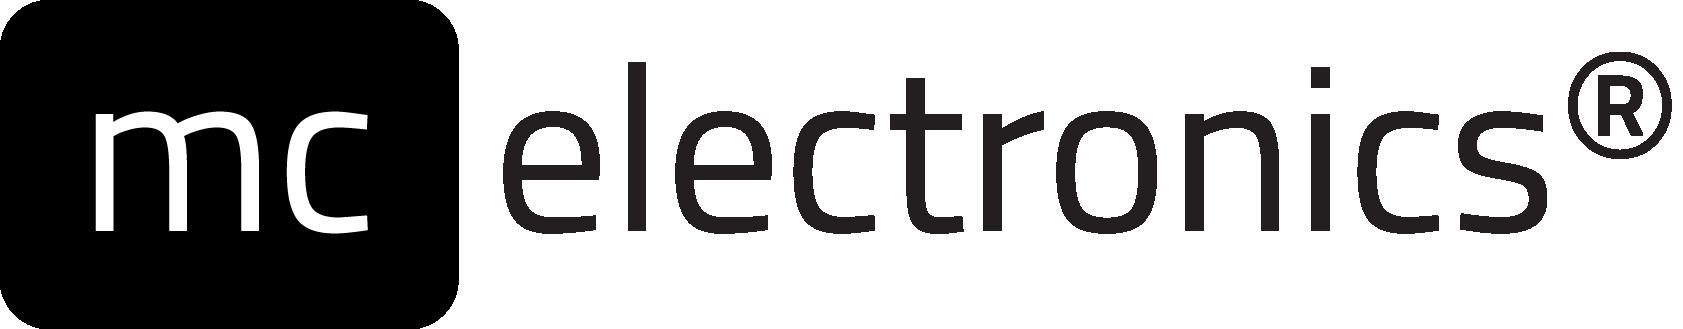 mcelectronics